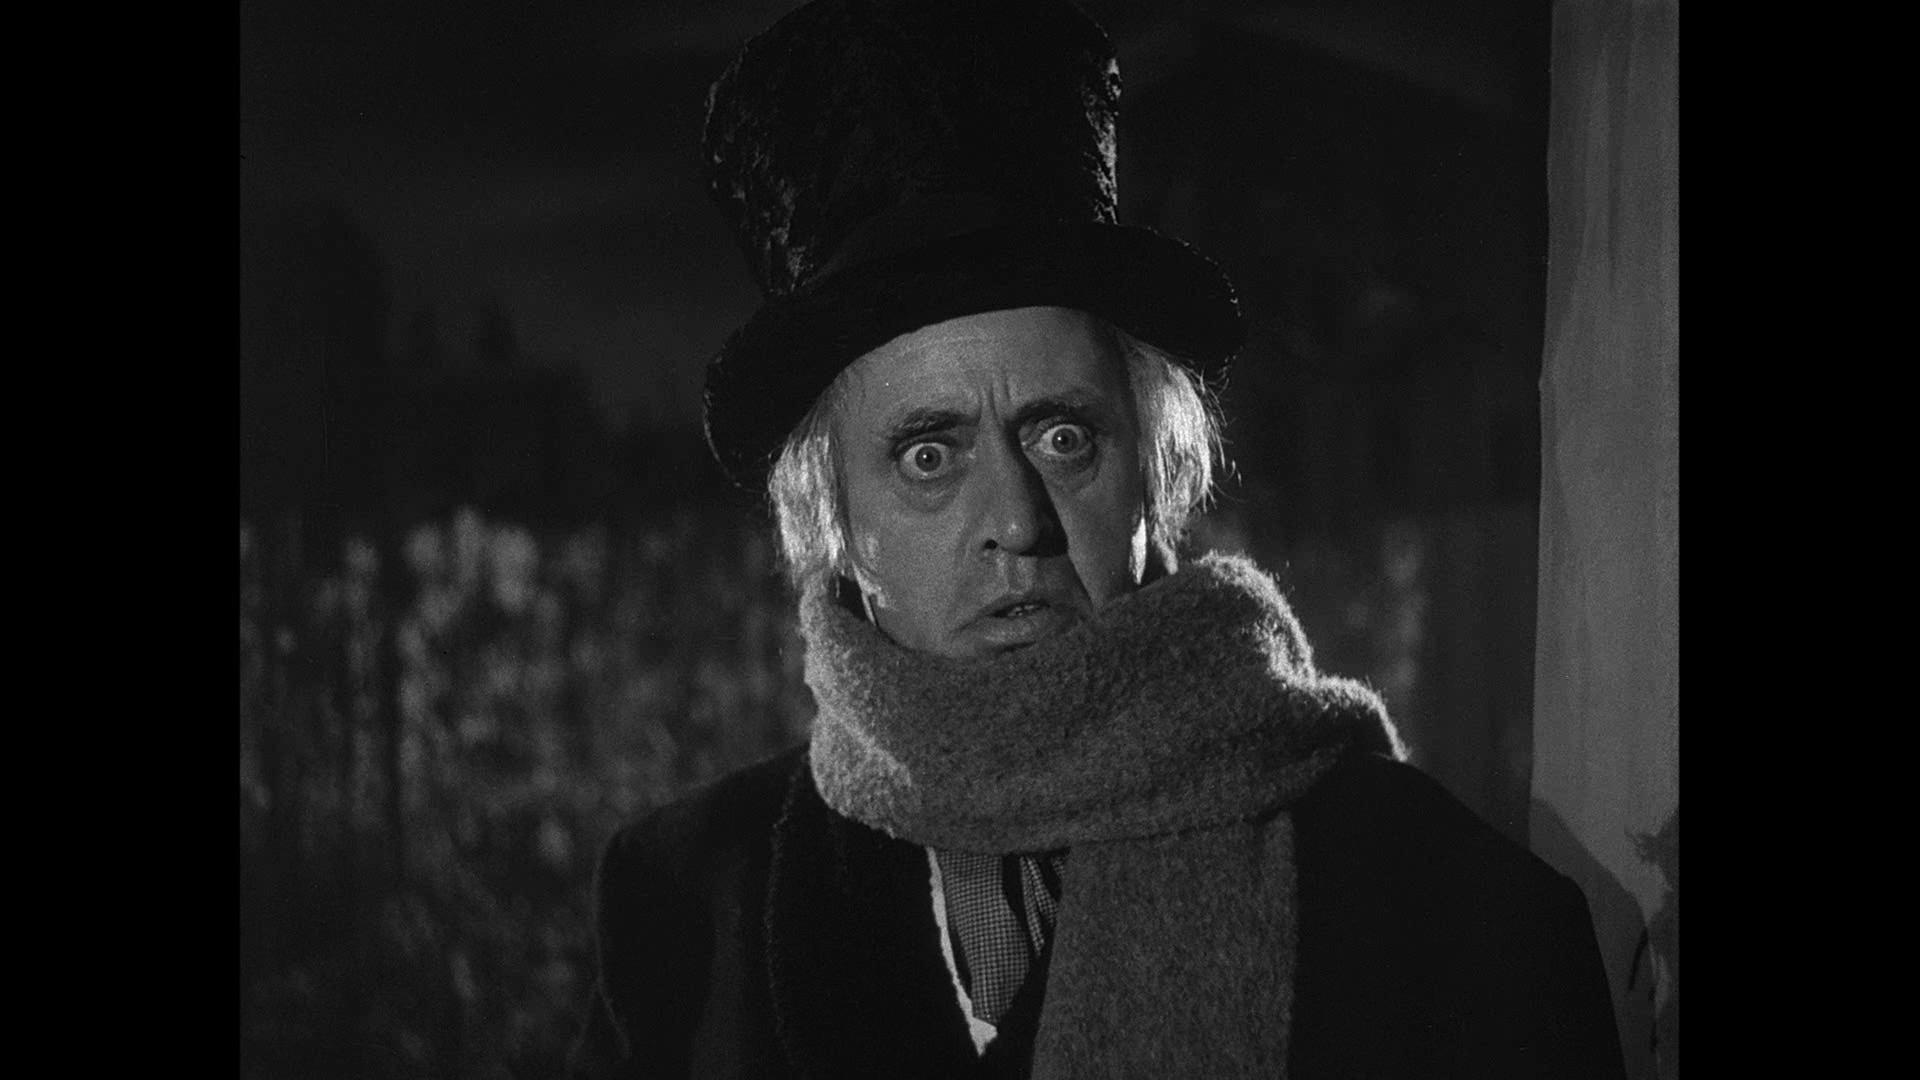 Res: 1920x1080, A Christmas Carol (1951) - Restored (Blu-ray) : DVD Talk